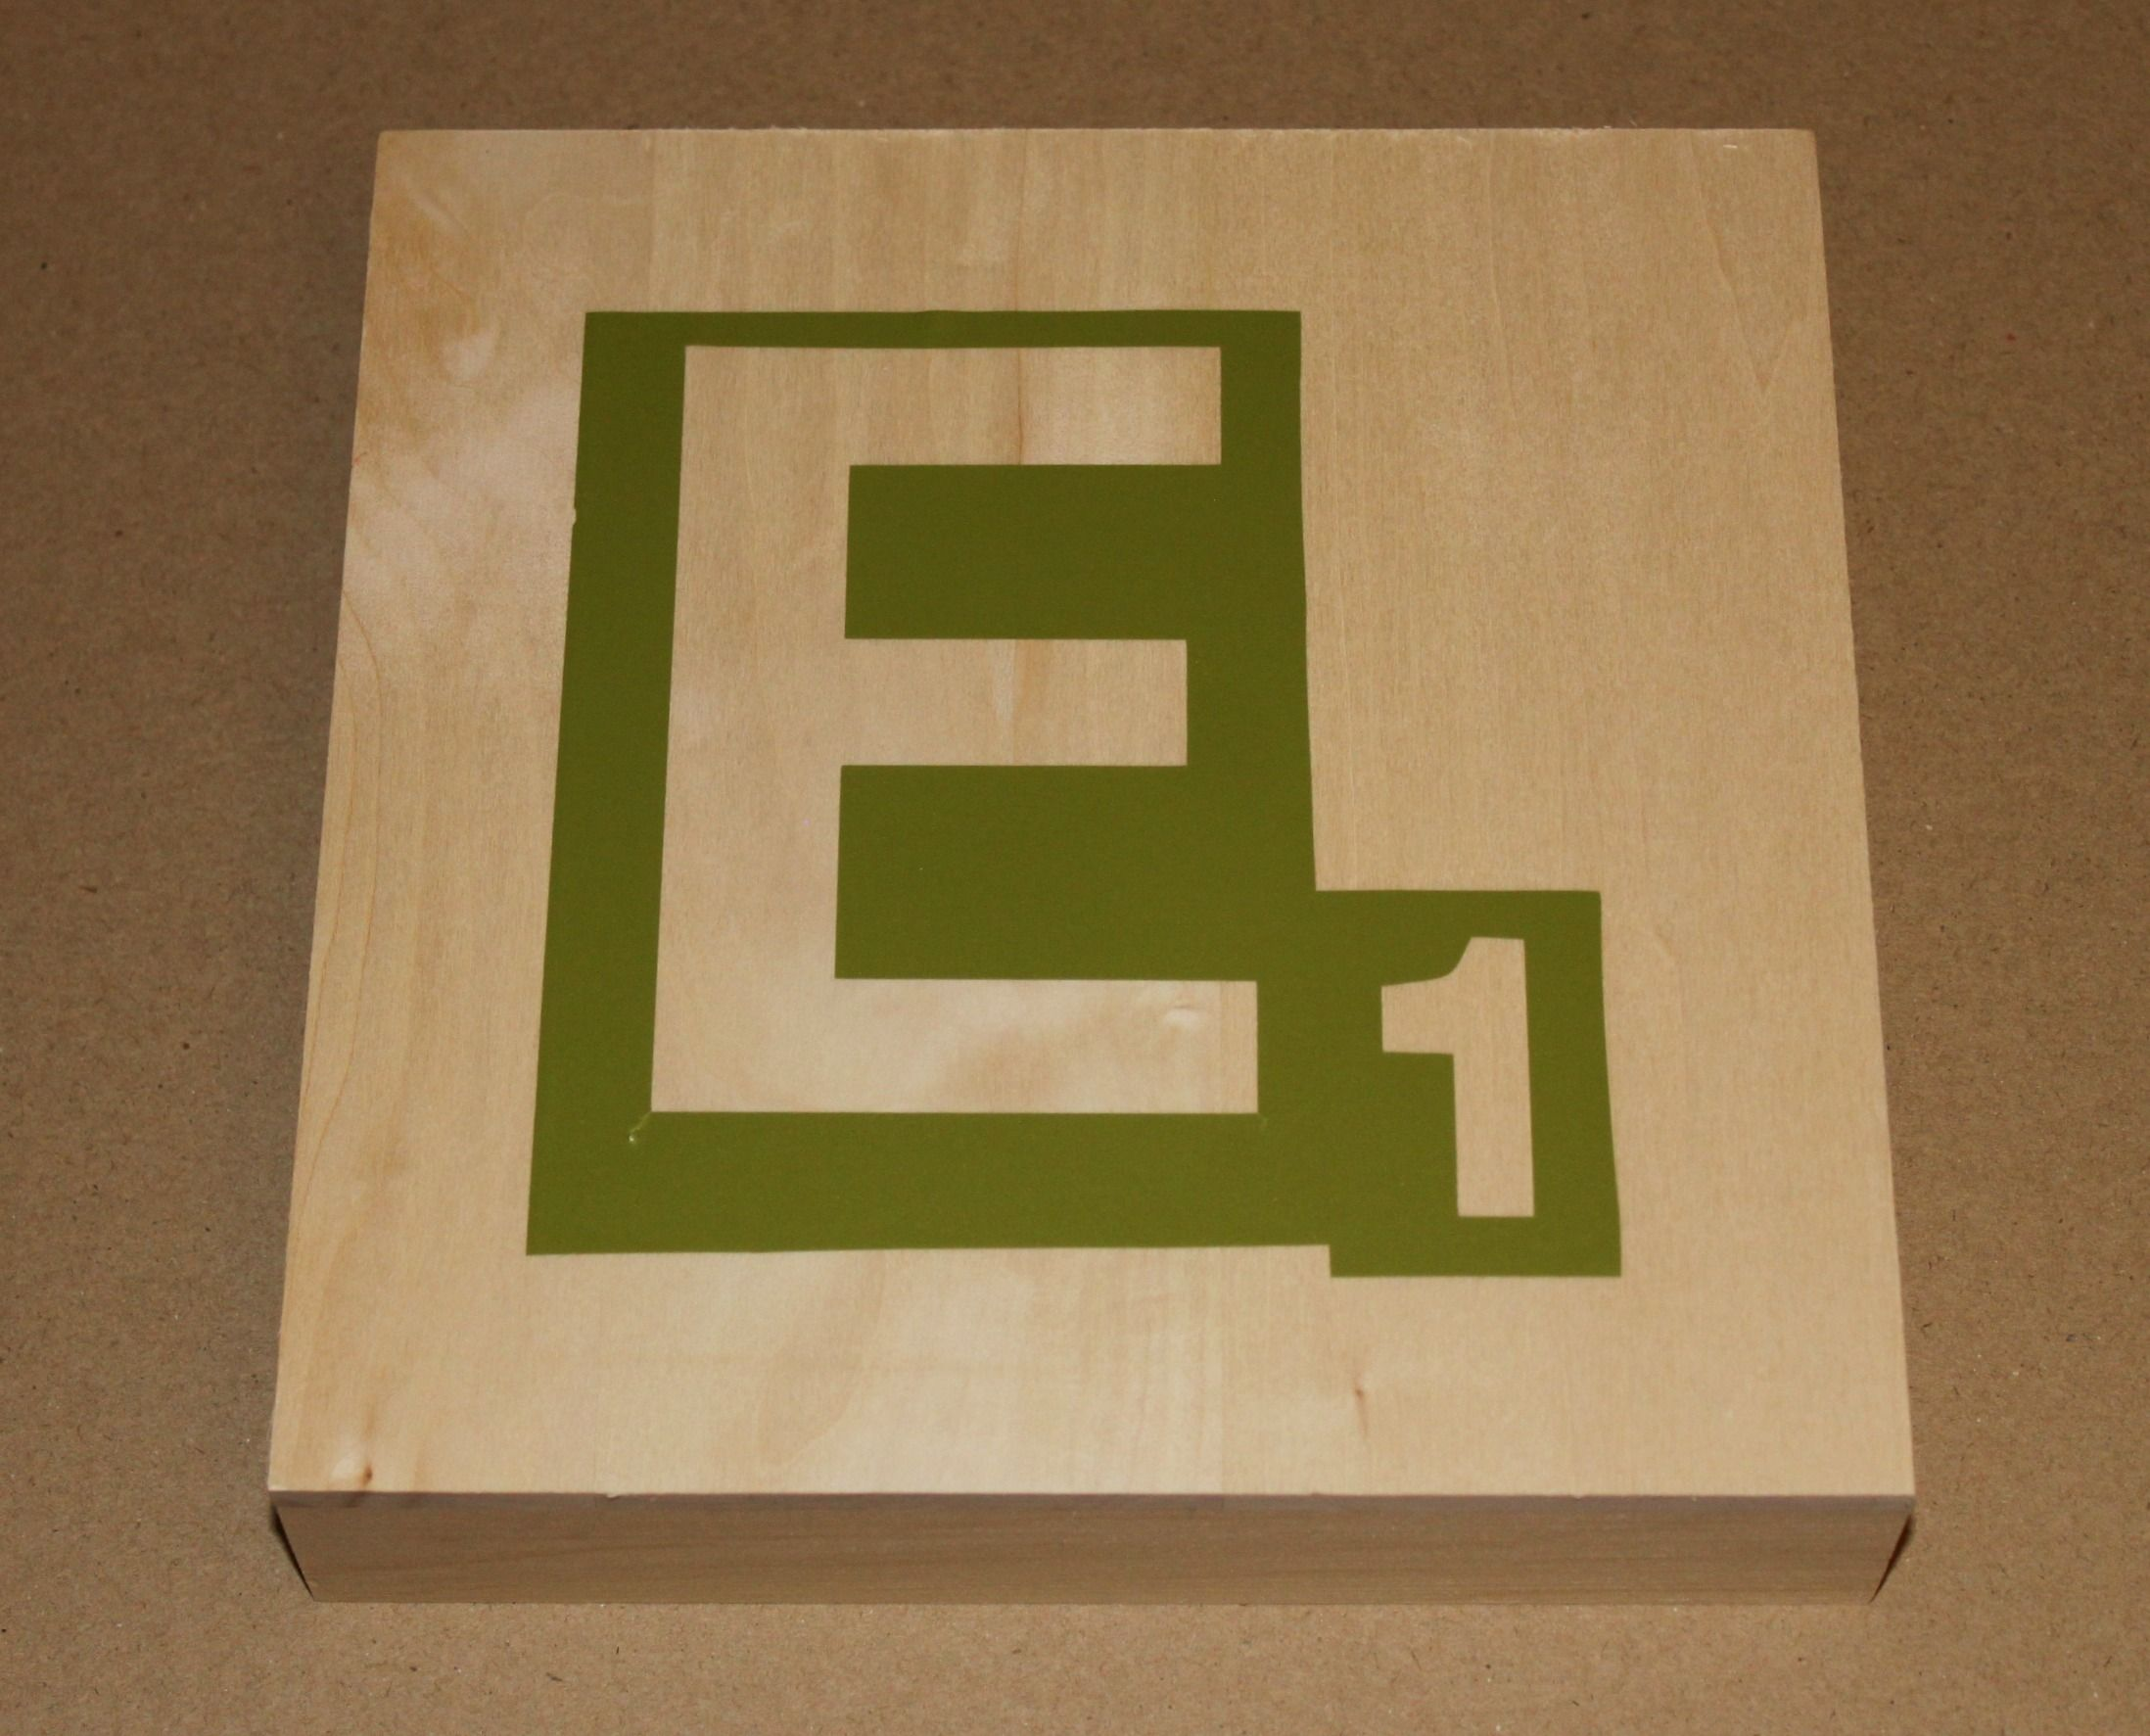 printable wooden scrabble tiles by monogram scrabble tile scrabble scrabble tiles and monograms